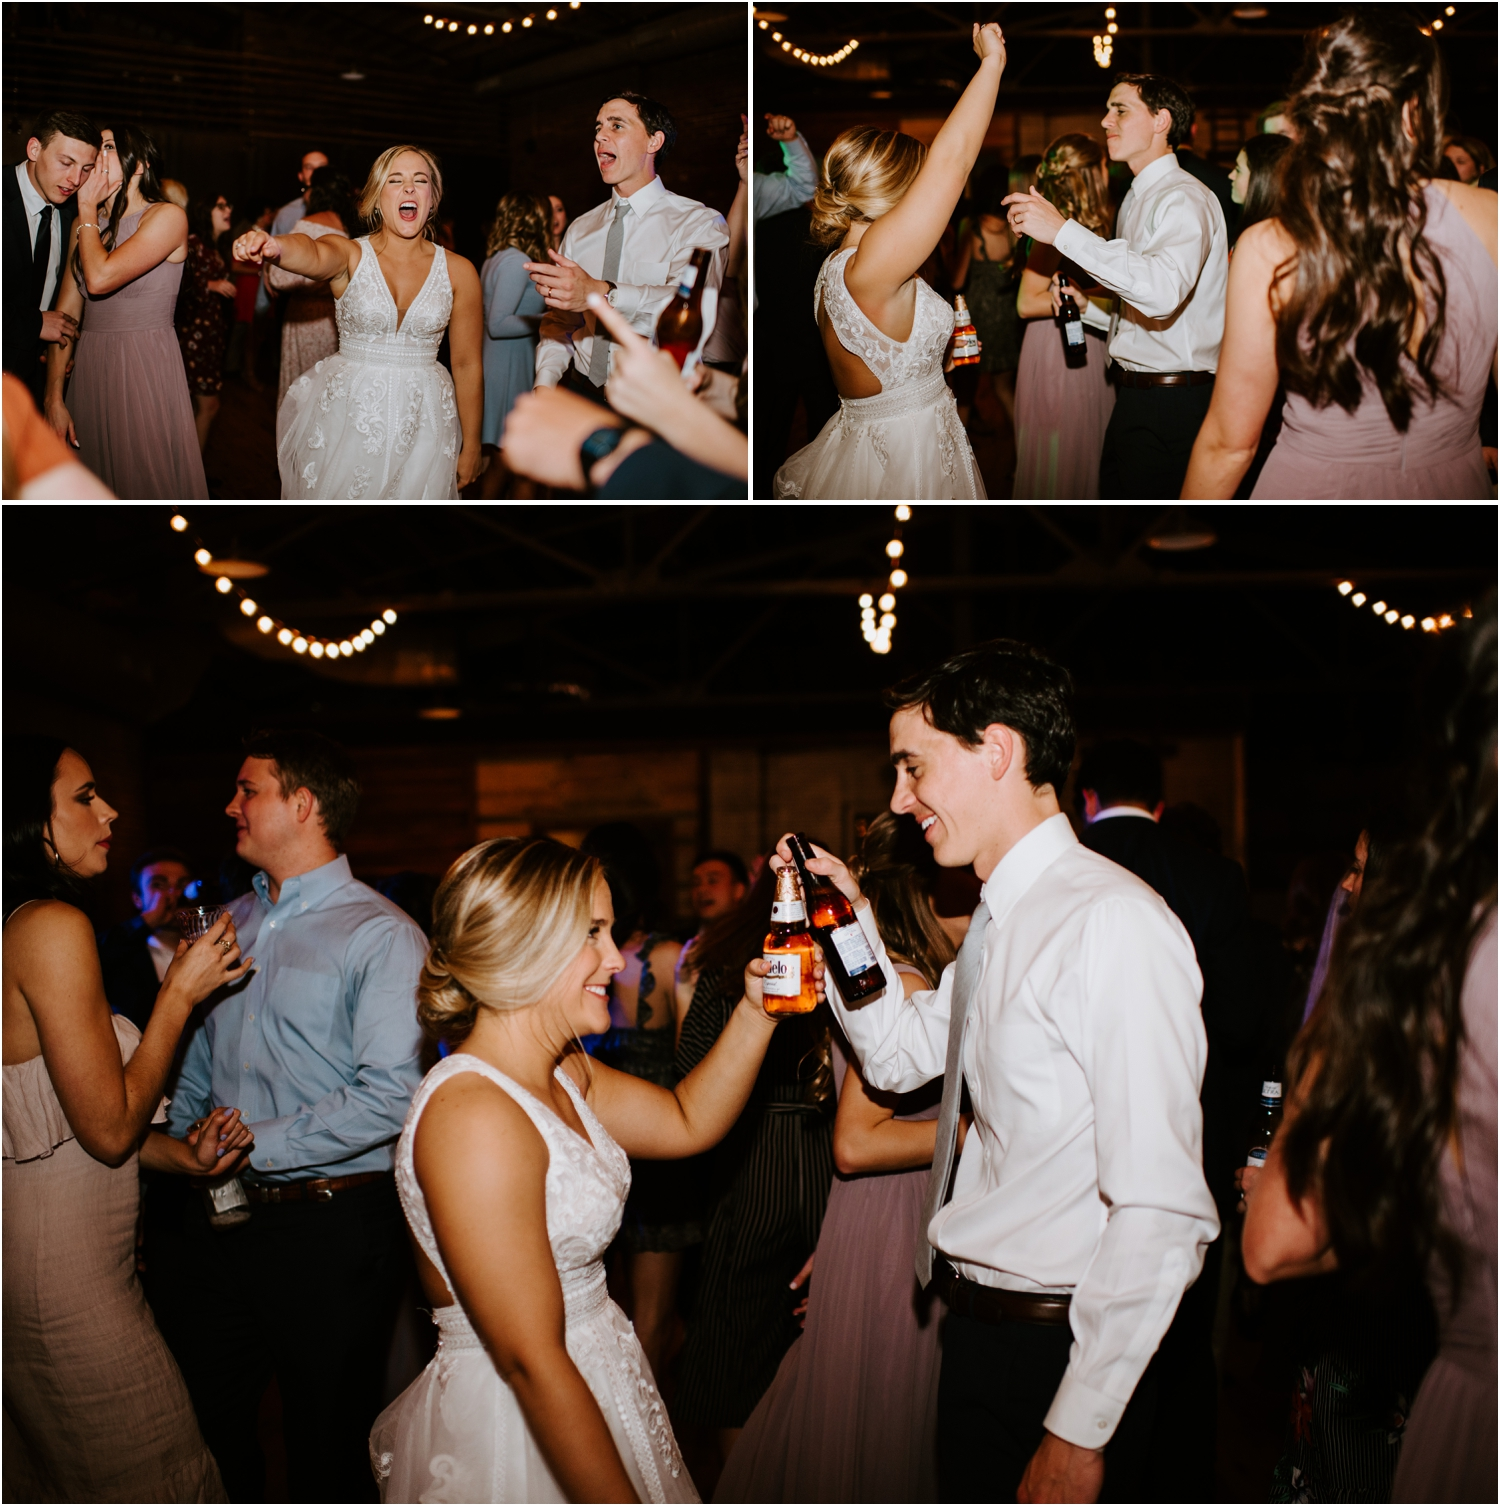 weddingreception_0175.jpg